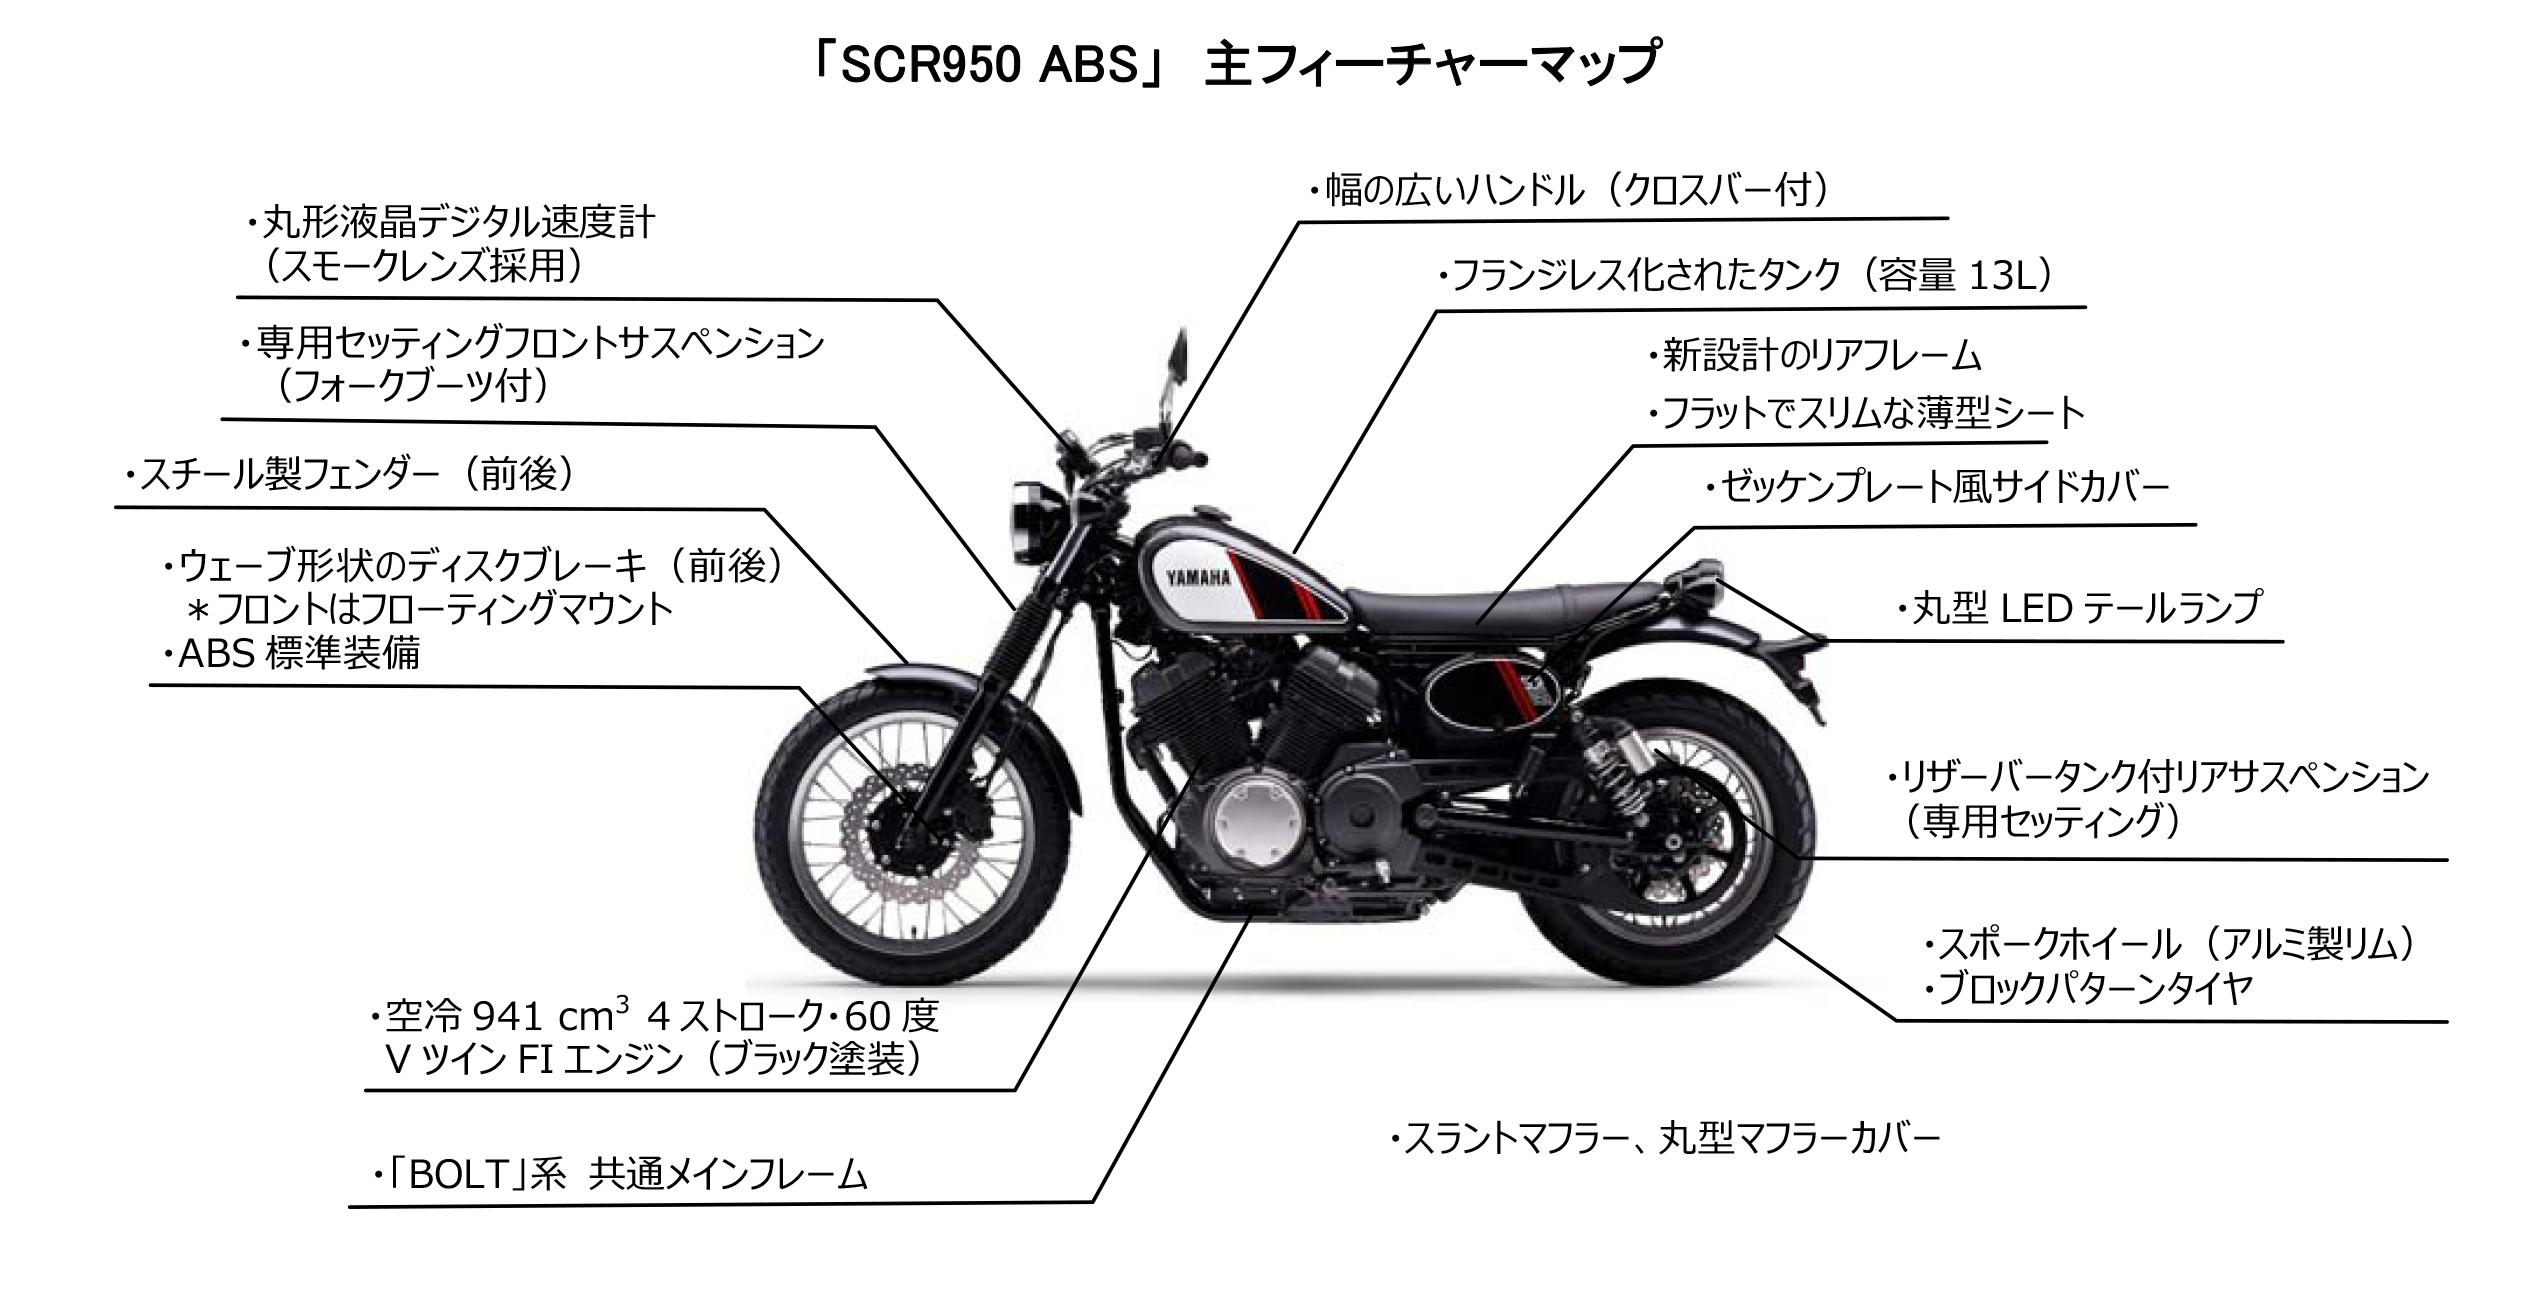 YAMAHA 2017 SCR950 ABS